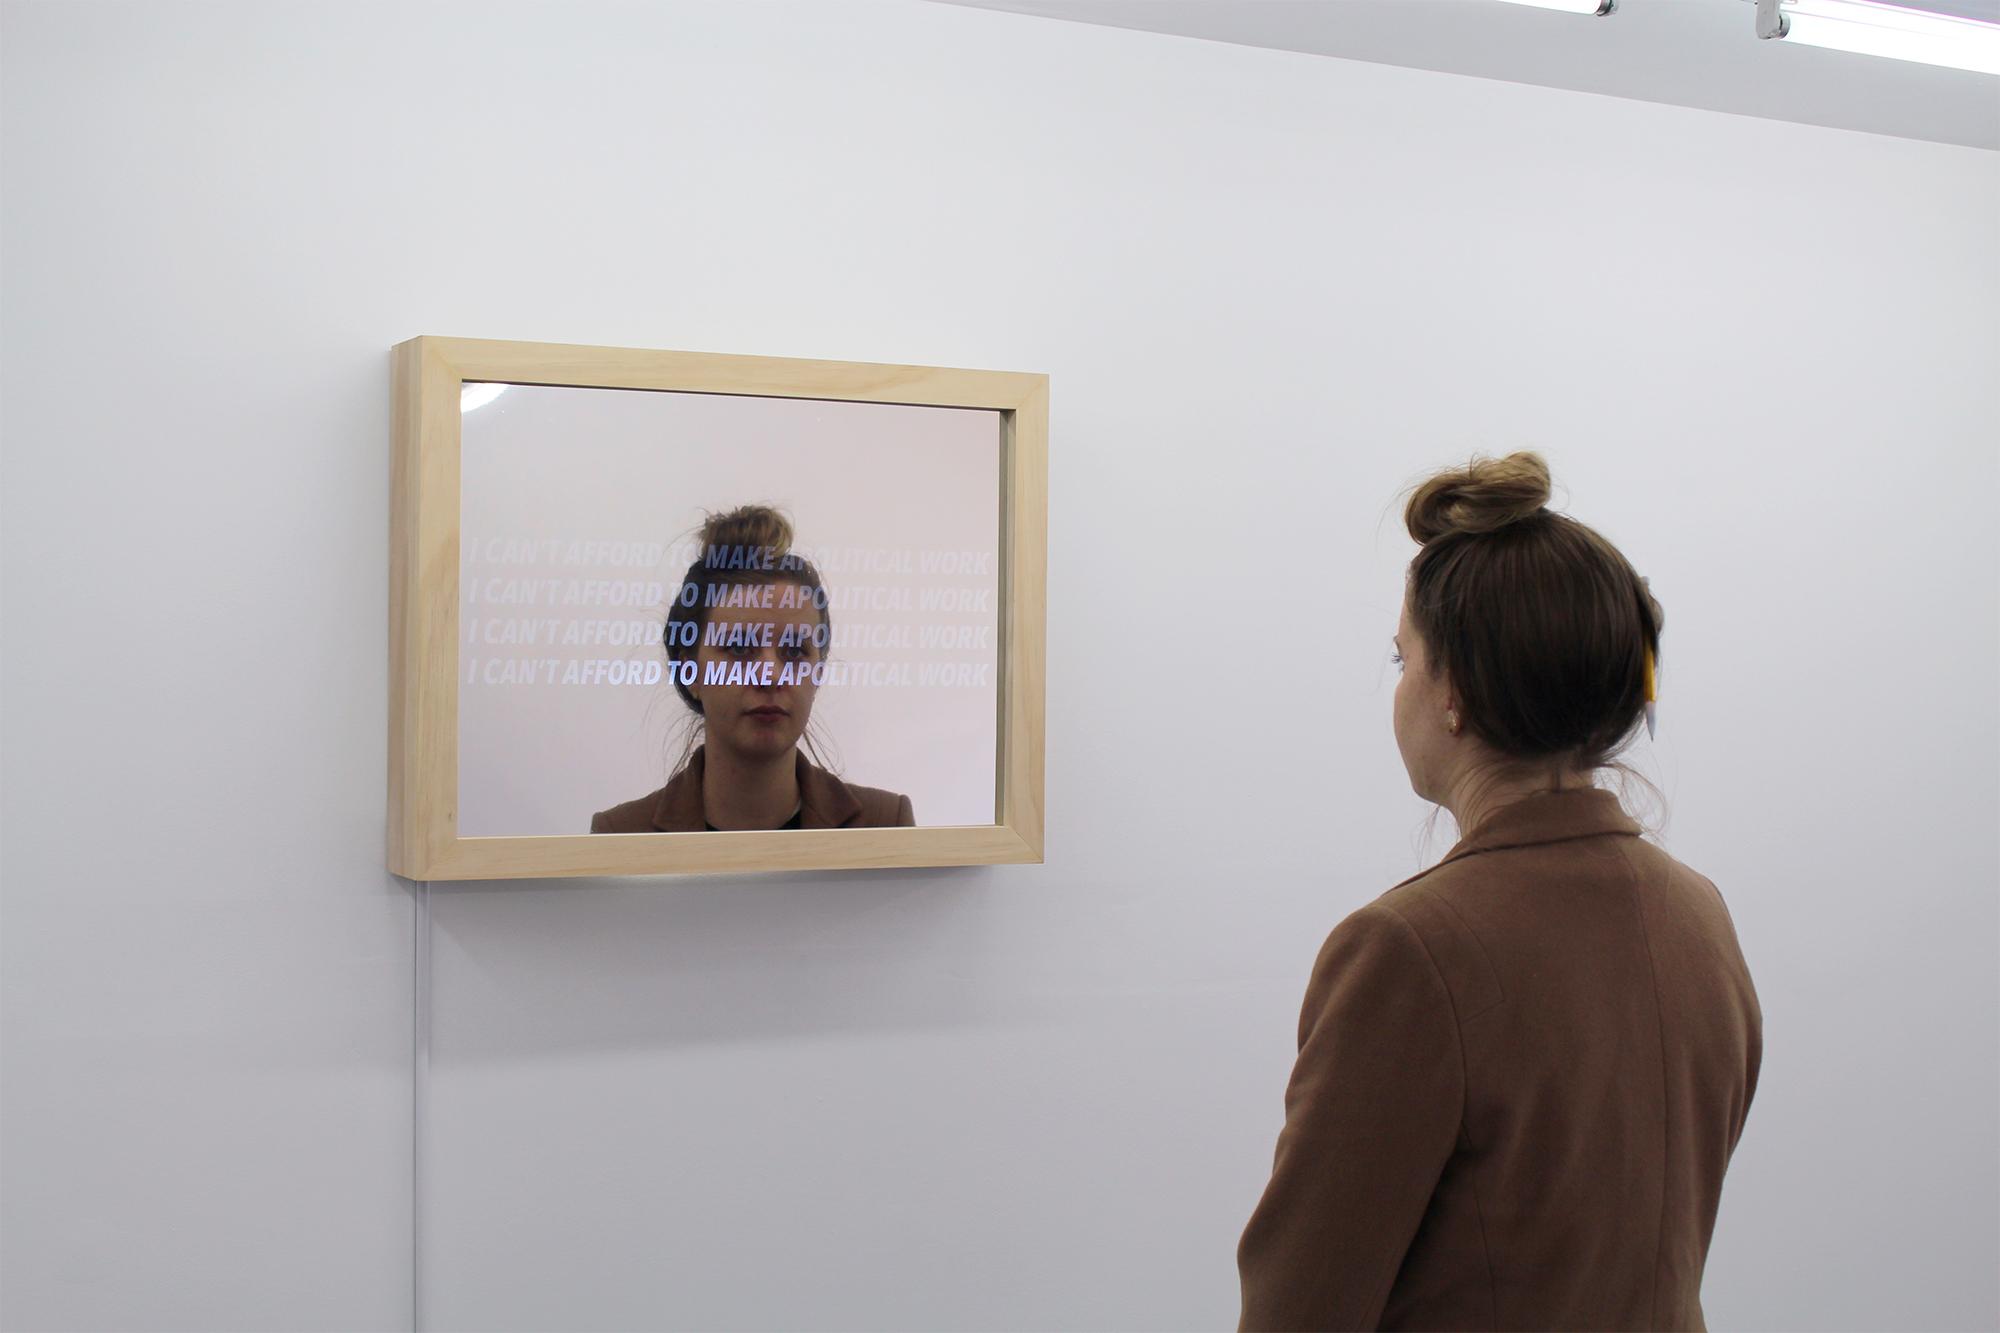 Wood, acrylic sheet, two-way mirror film, strobe light